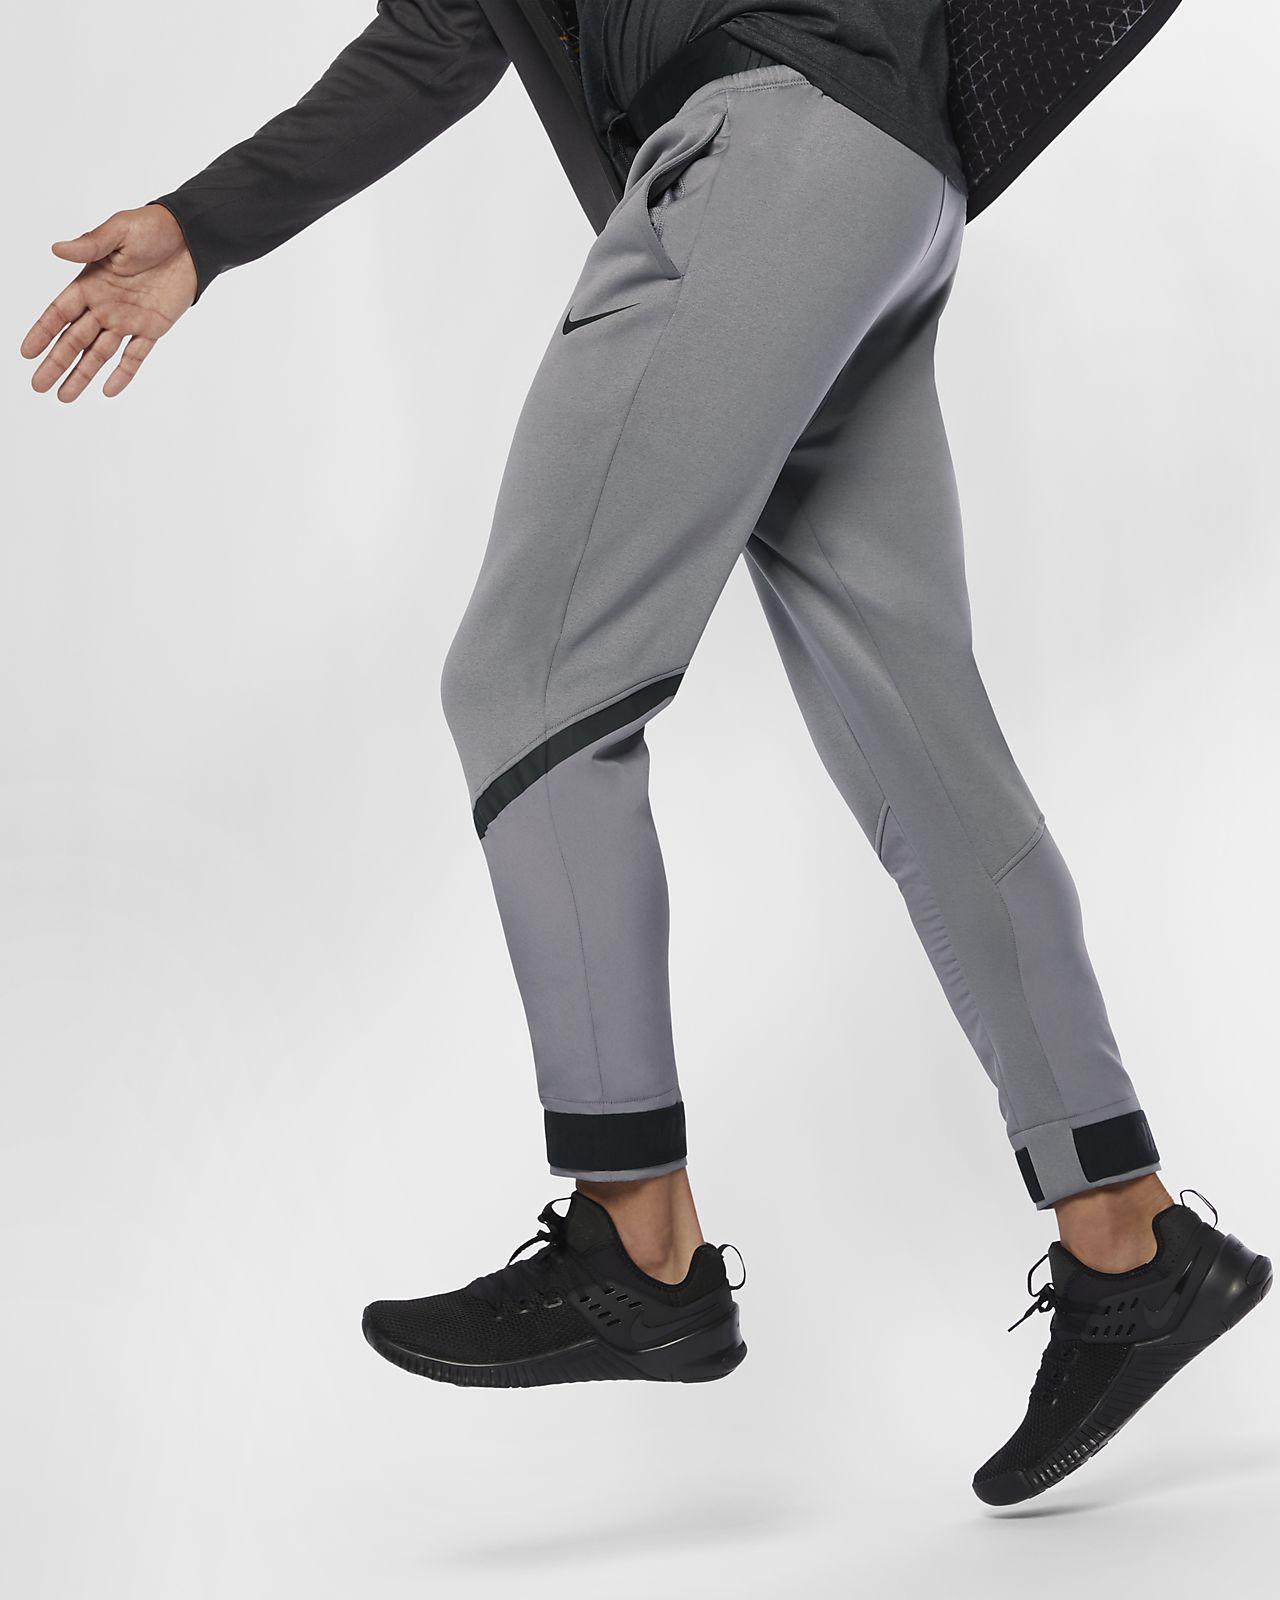 Nike Therma 3.0 Modern Herren-Trainingshose